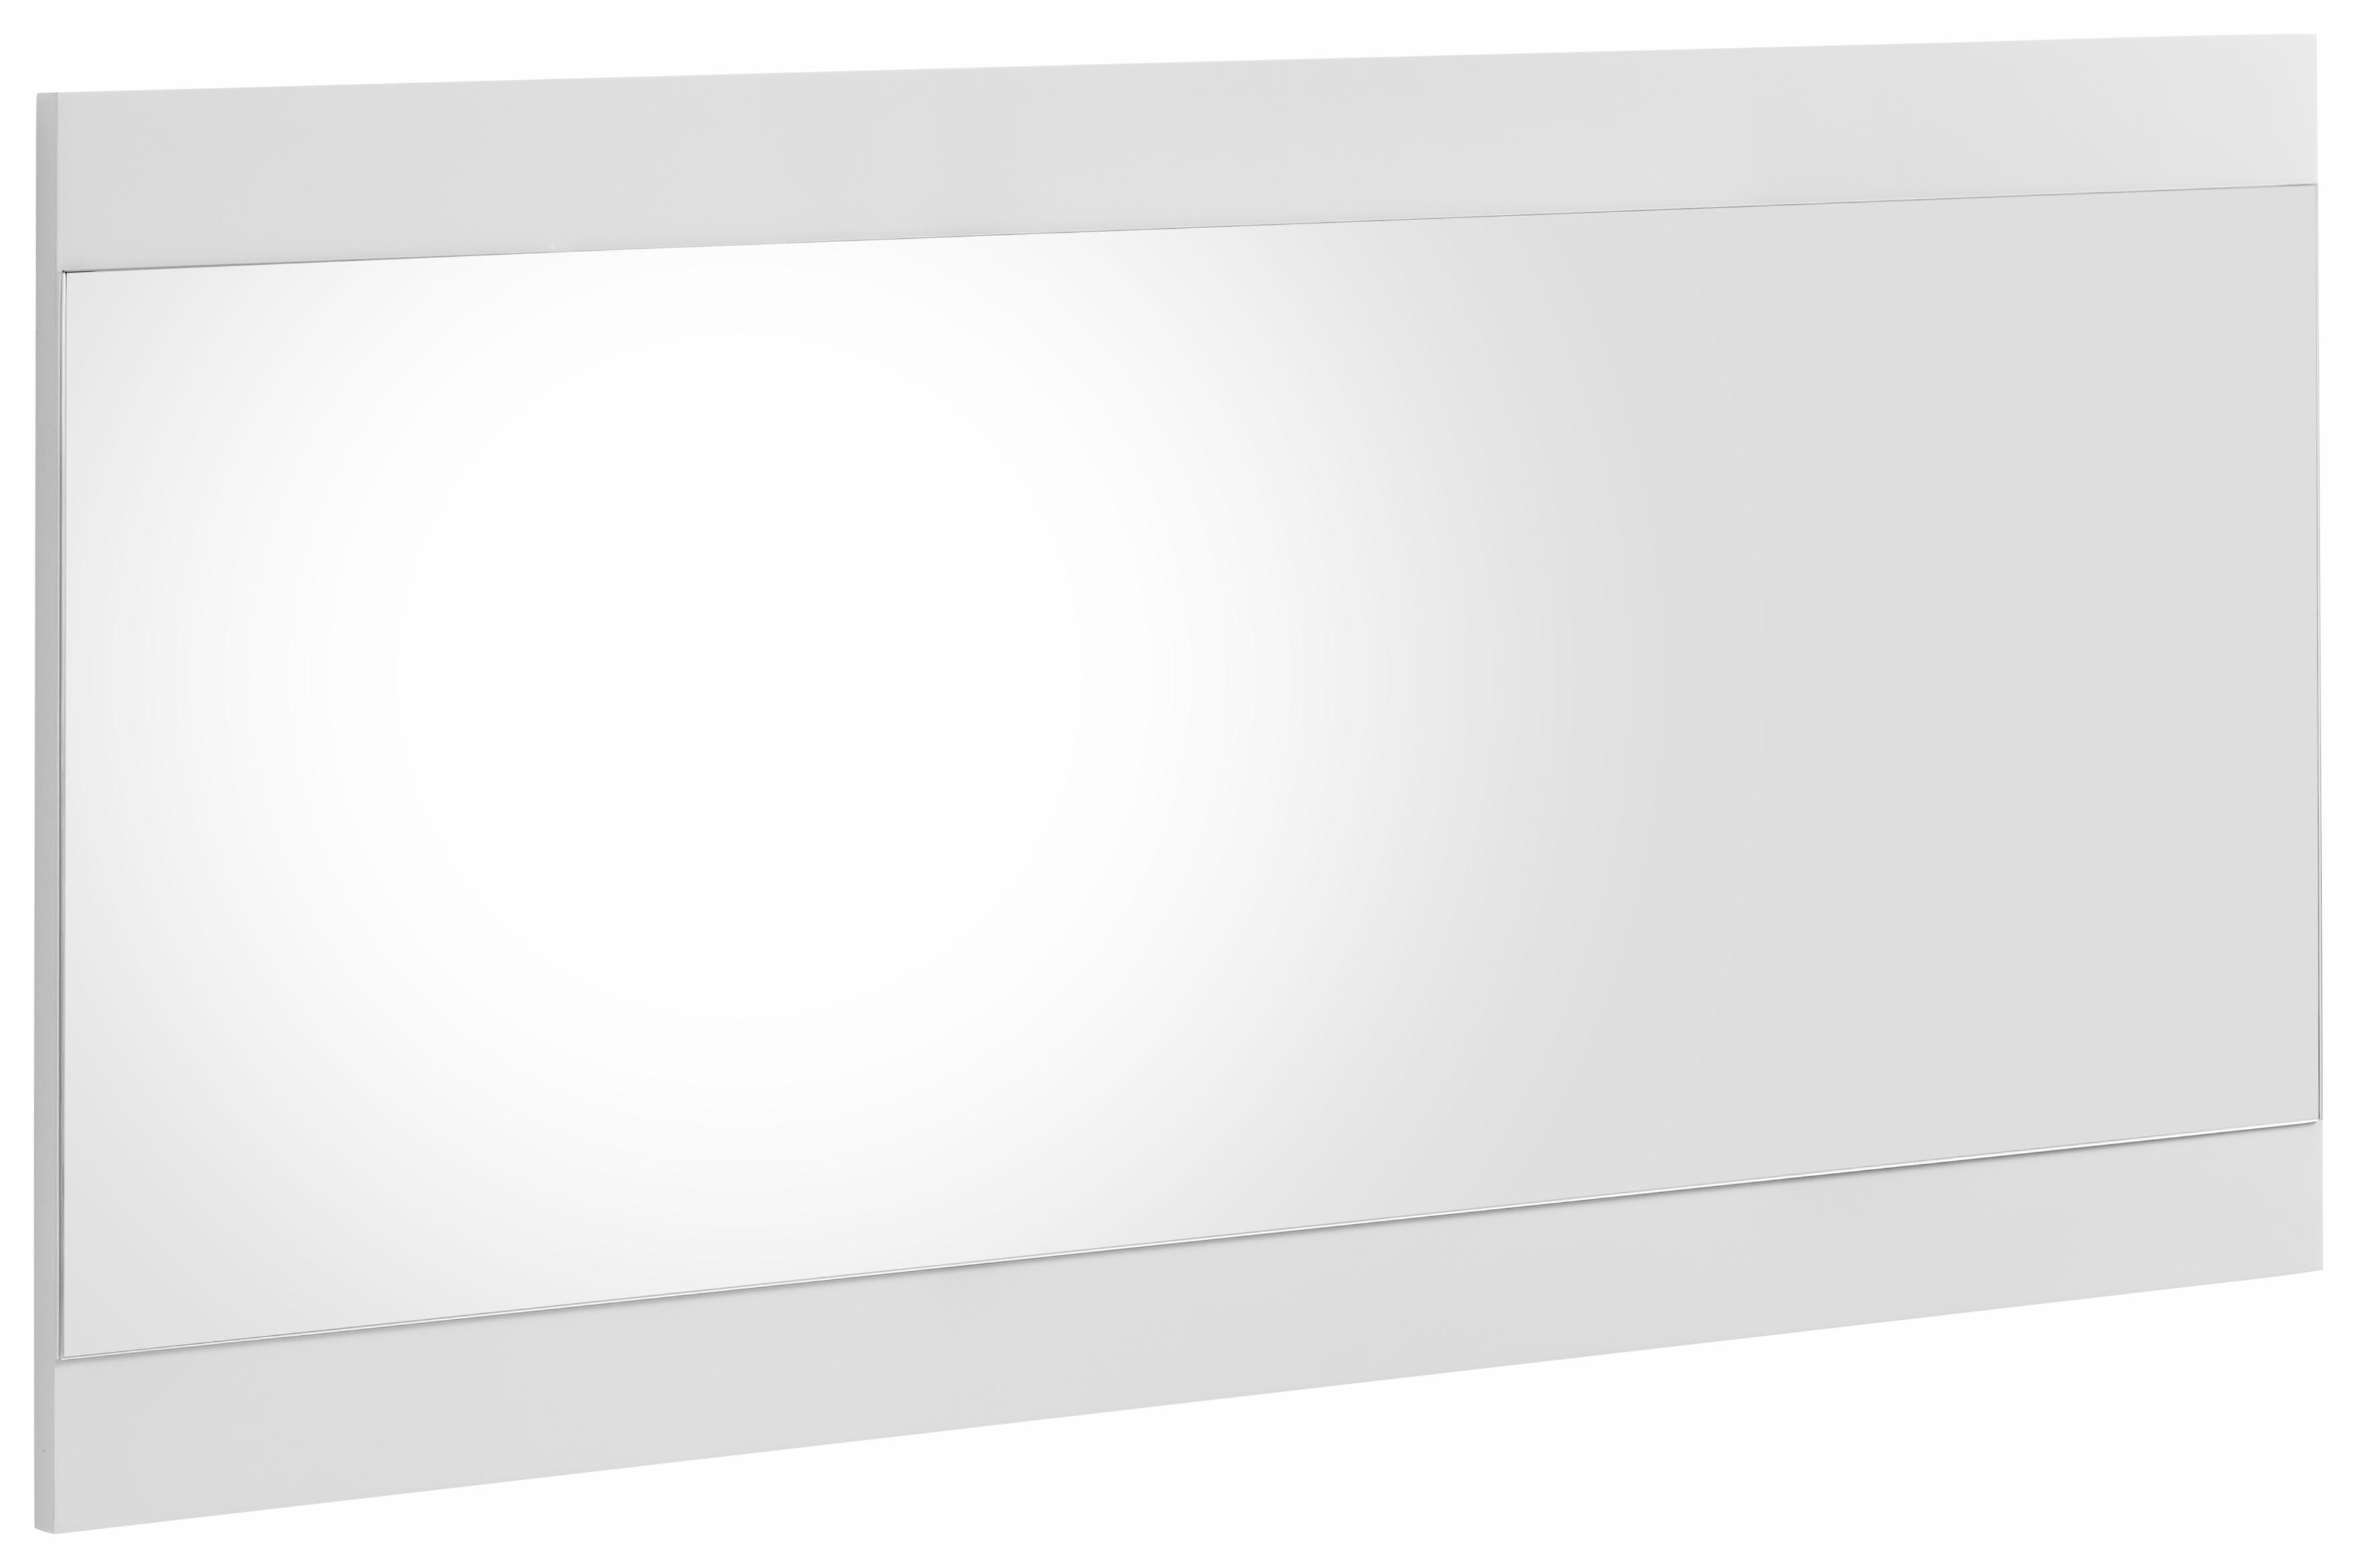 Finest schoonmaak tips with plakspiegel rond for Ronde plakspiegel